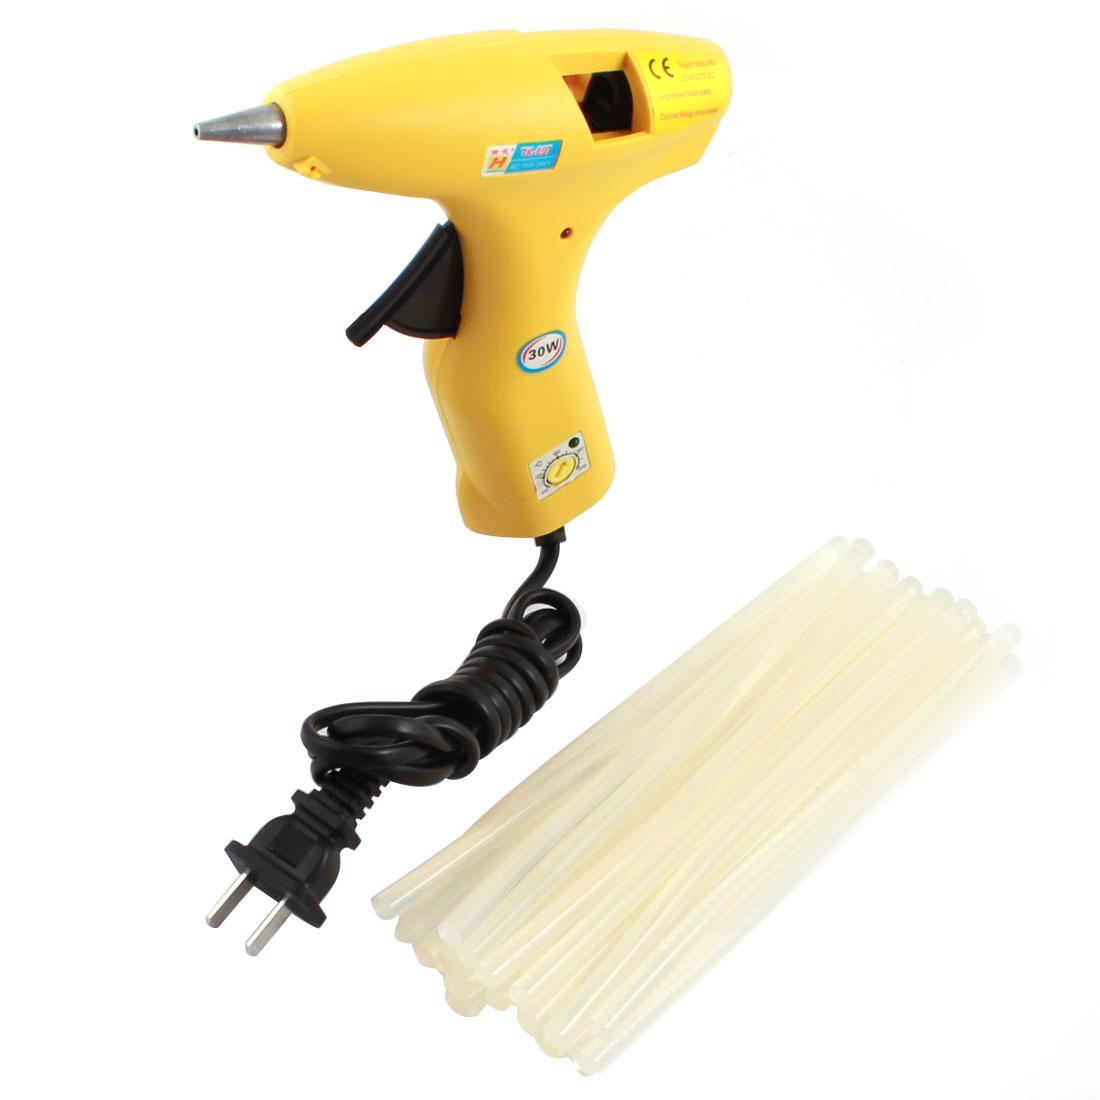 AC100V-240V US Plug Plastic Shell Arts Craft Crafting 30W Yellow Glue Gun + 20Pcs 7x180mm Hot Melt Adhesive Sticks